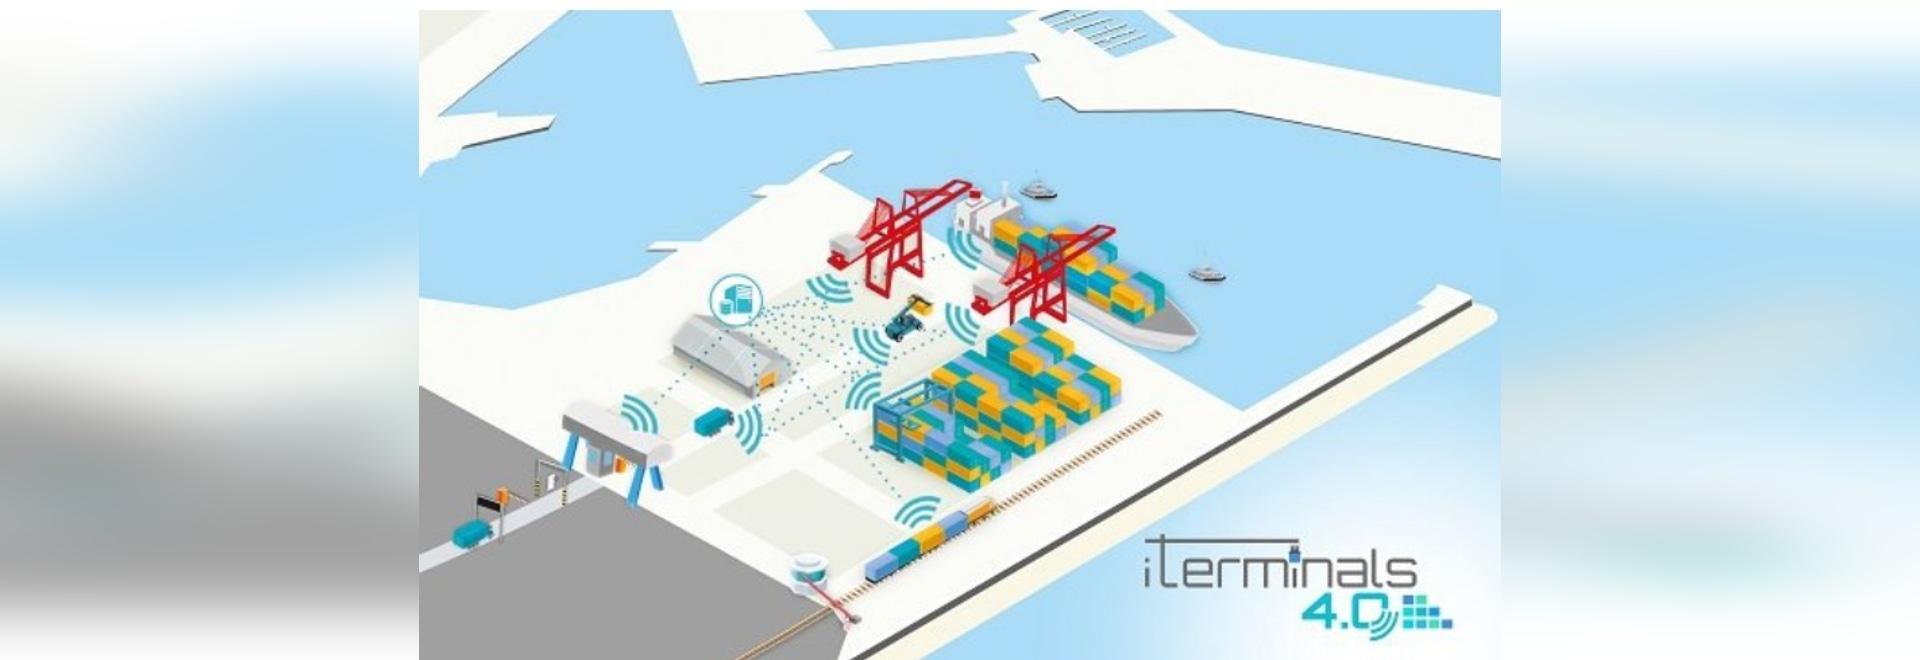 iTerminals will boost big data use among box ship ports